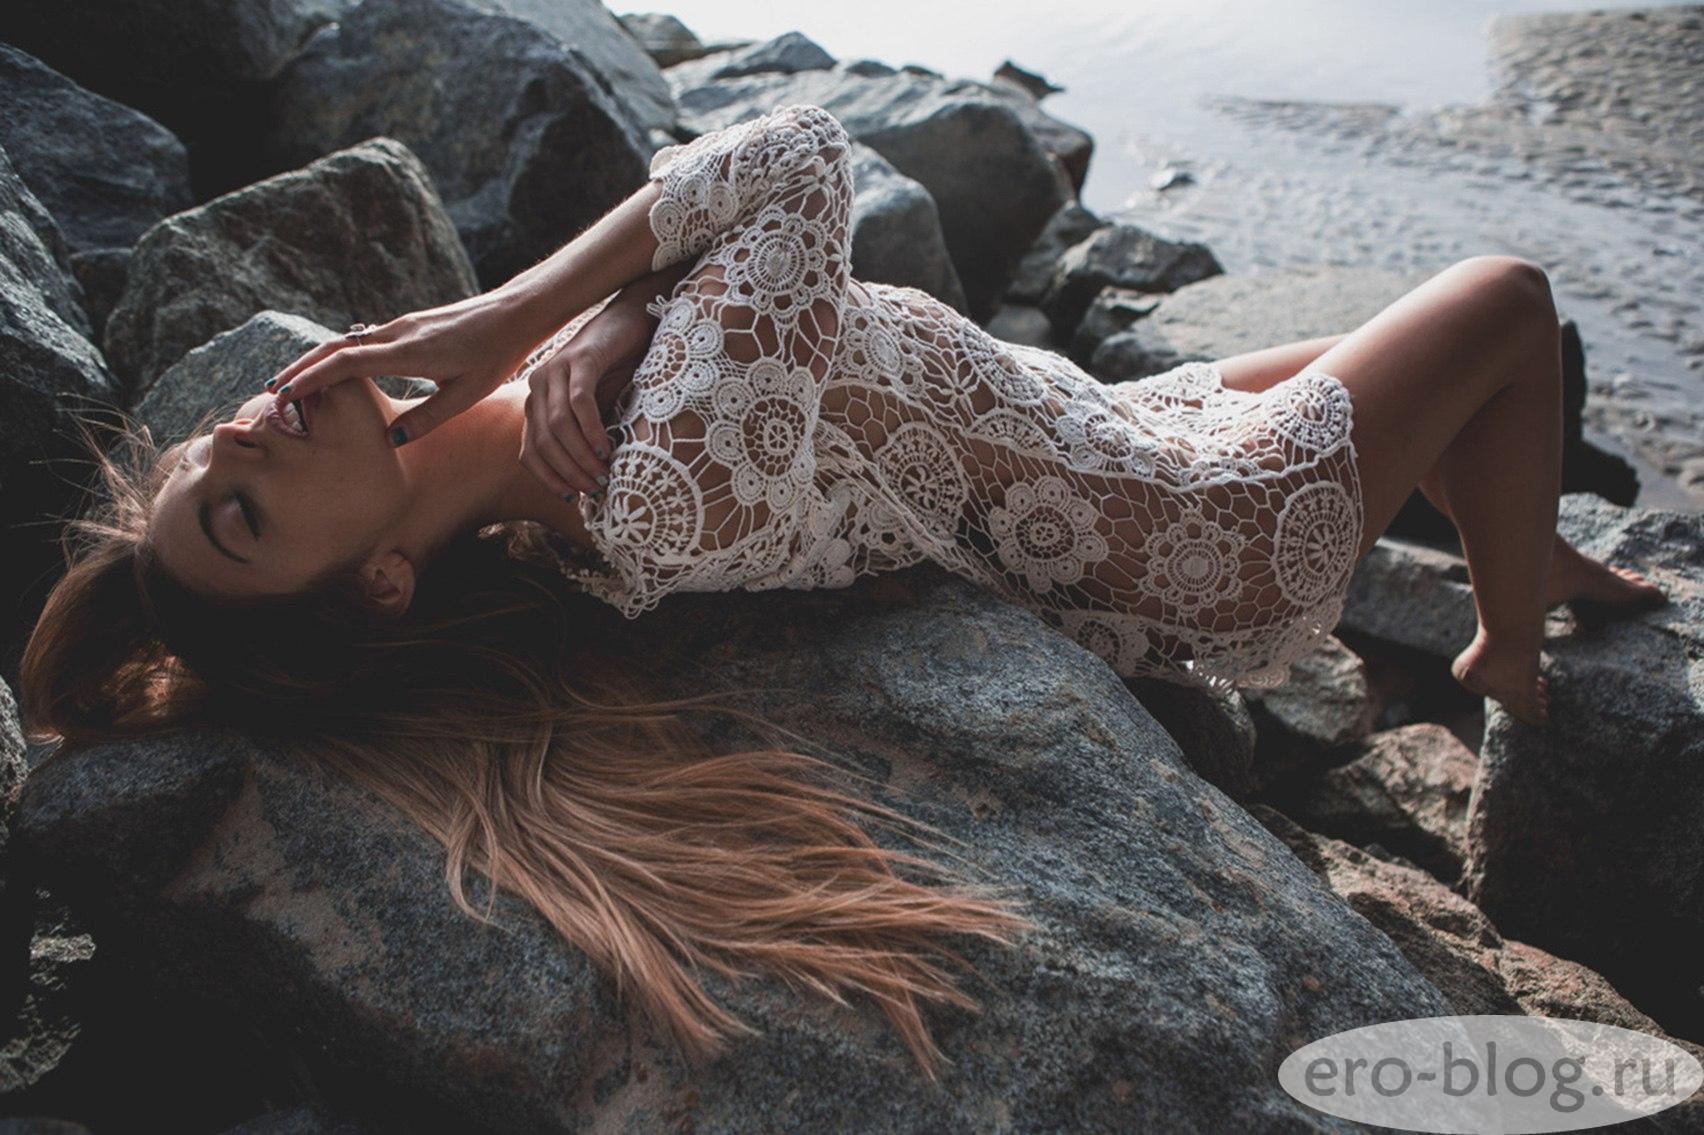 Голая обнаженная Кармелла Роуз интимные фото звезды